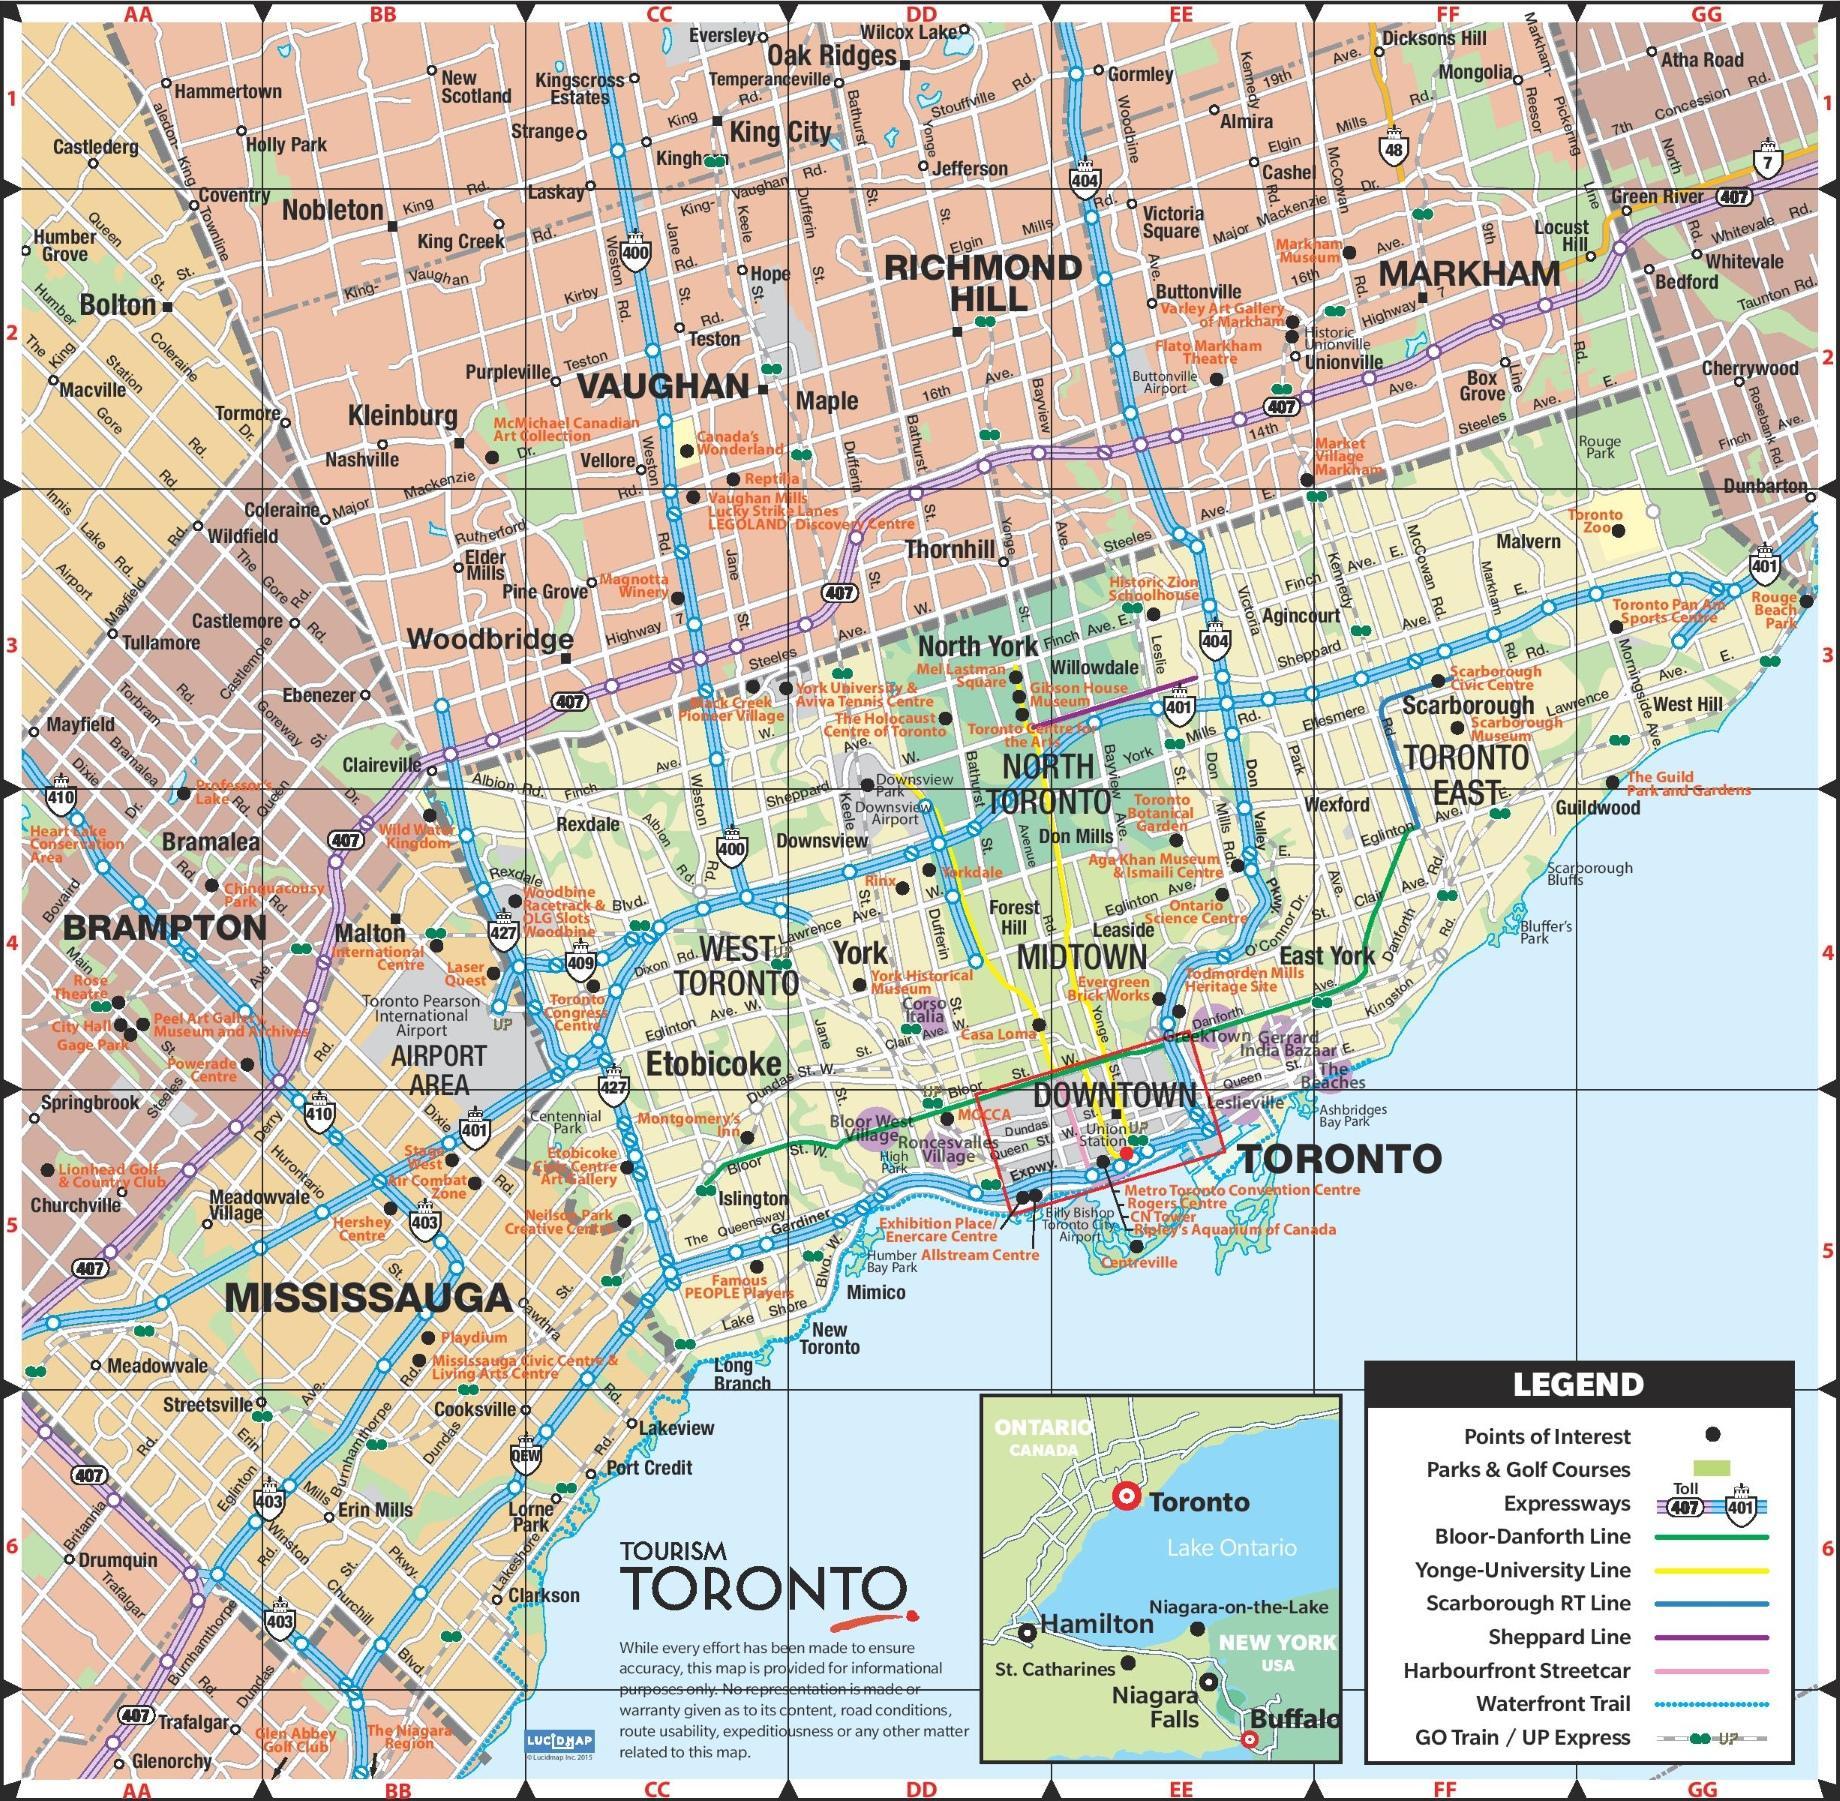 Toronto map - Map of Toronto city (Canada)